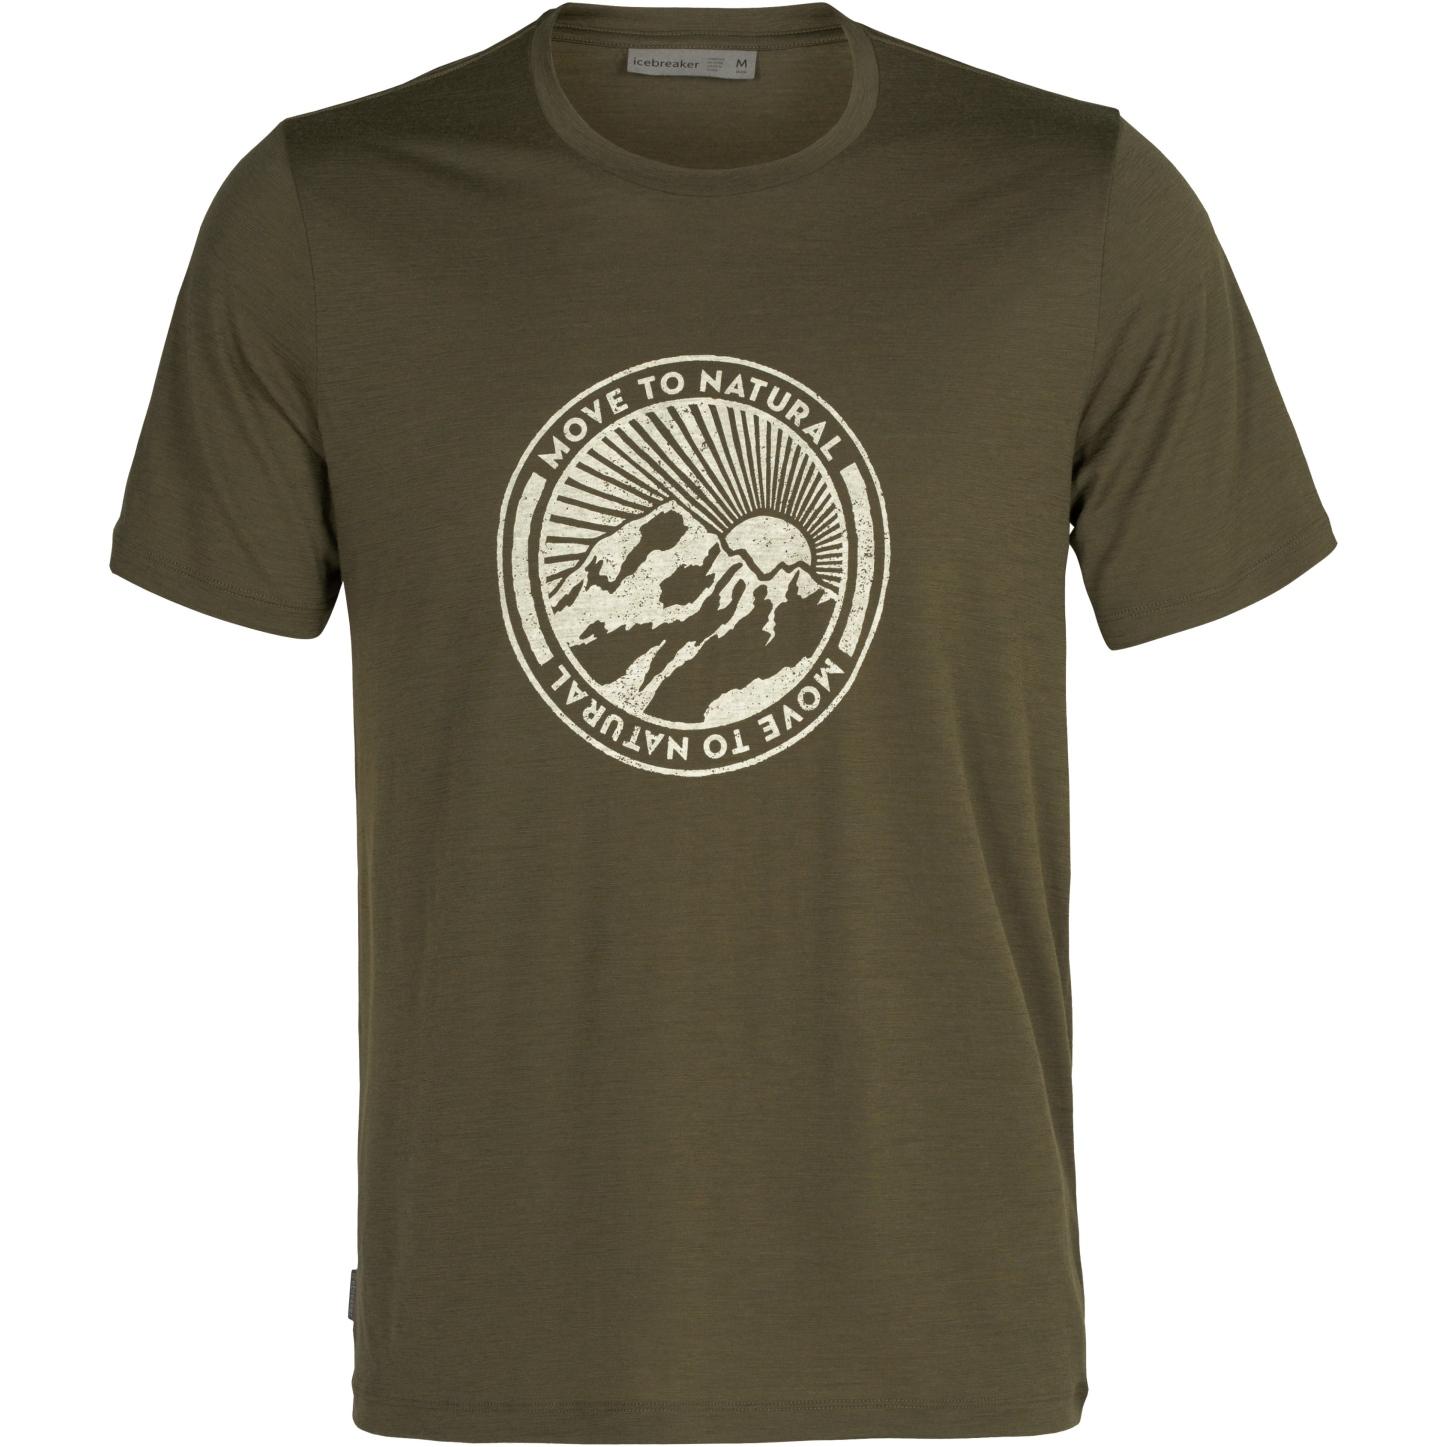 Produktbild von Icebreaker Tech Lite II Move to Natural Mountain Herren T-Shirt - Loden